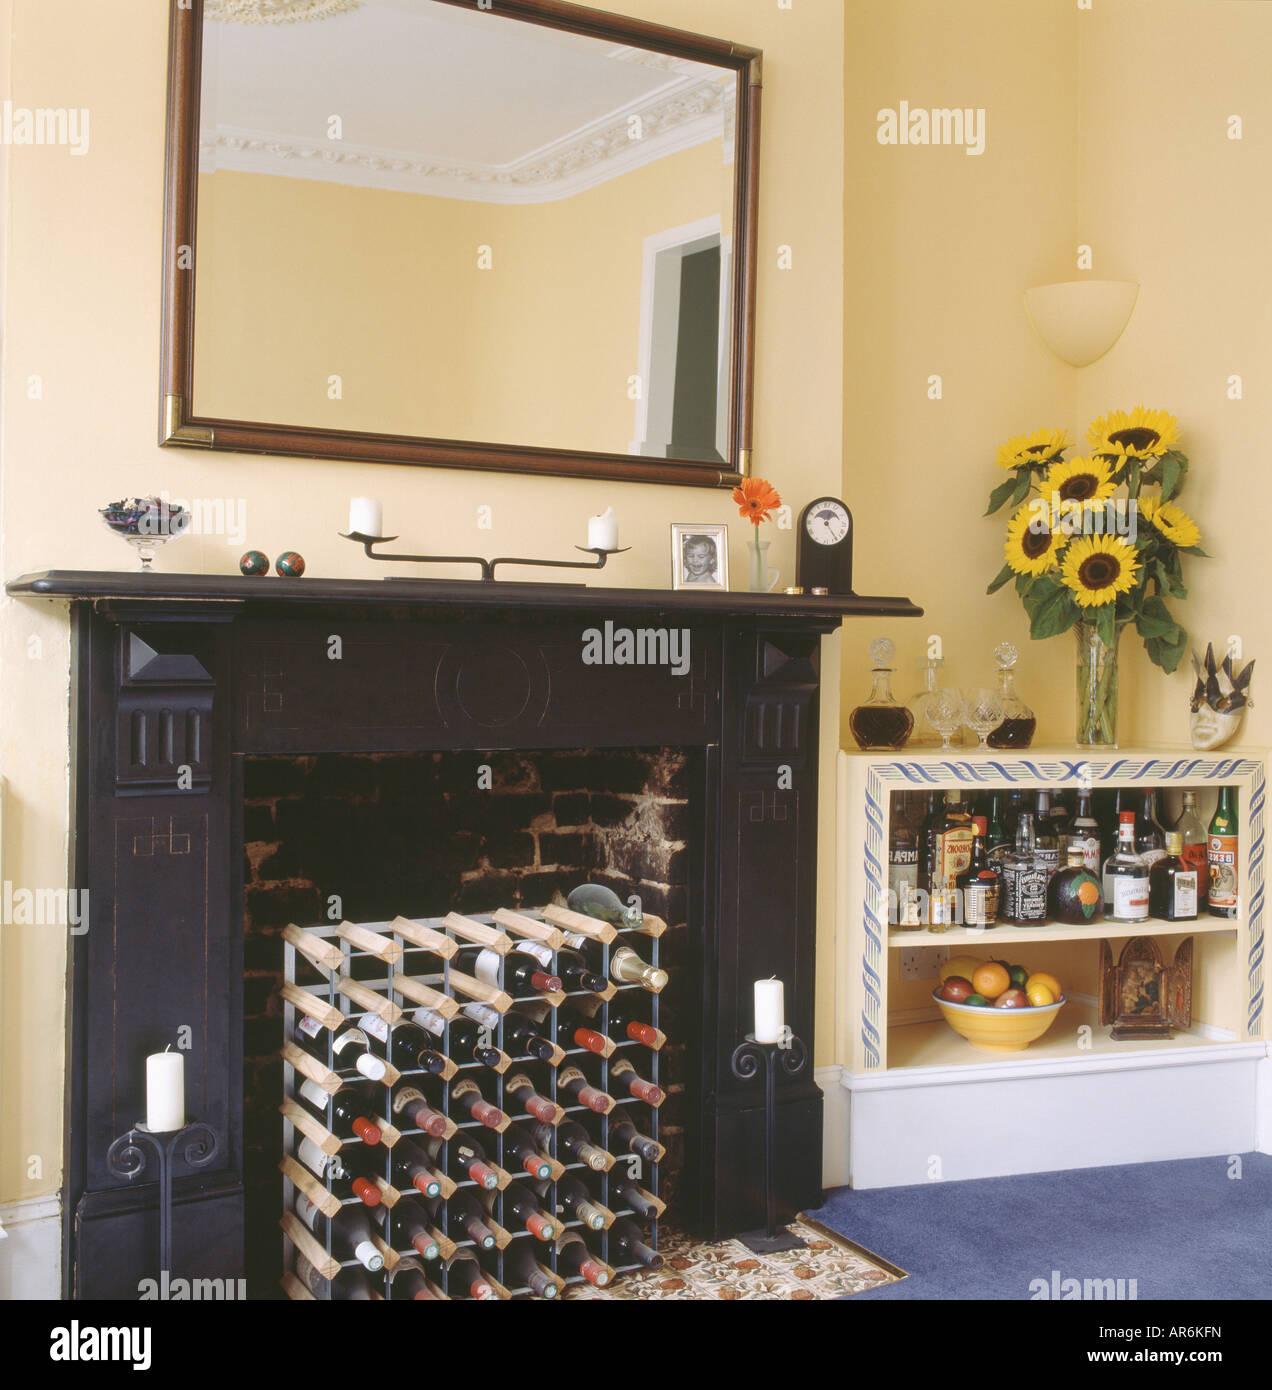 Fireplace Storage wine storage in fireplace below large mirror in pastel yellow